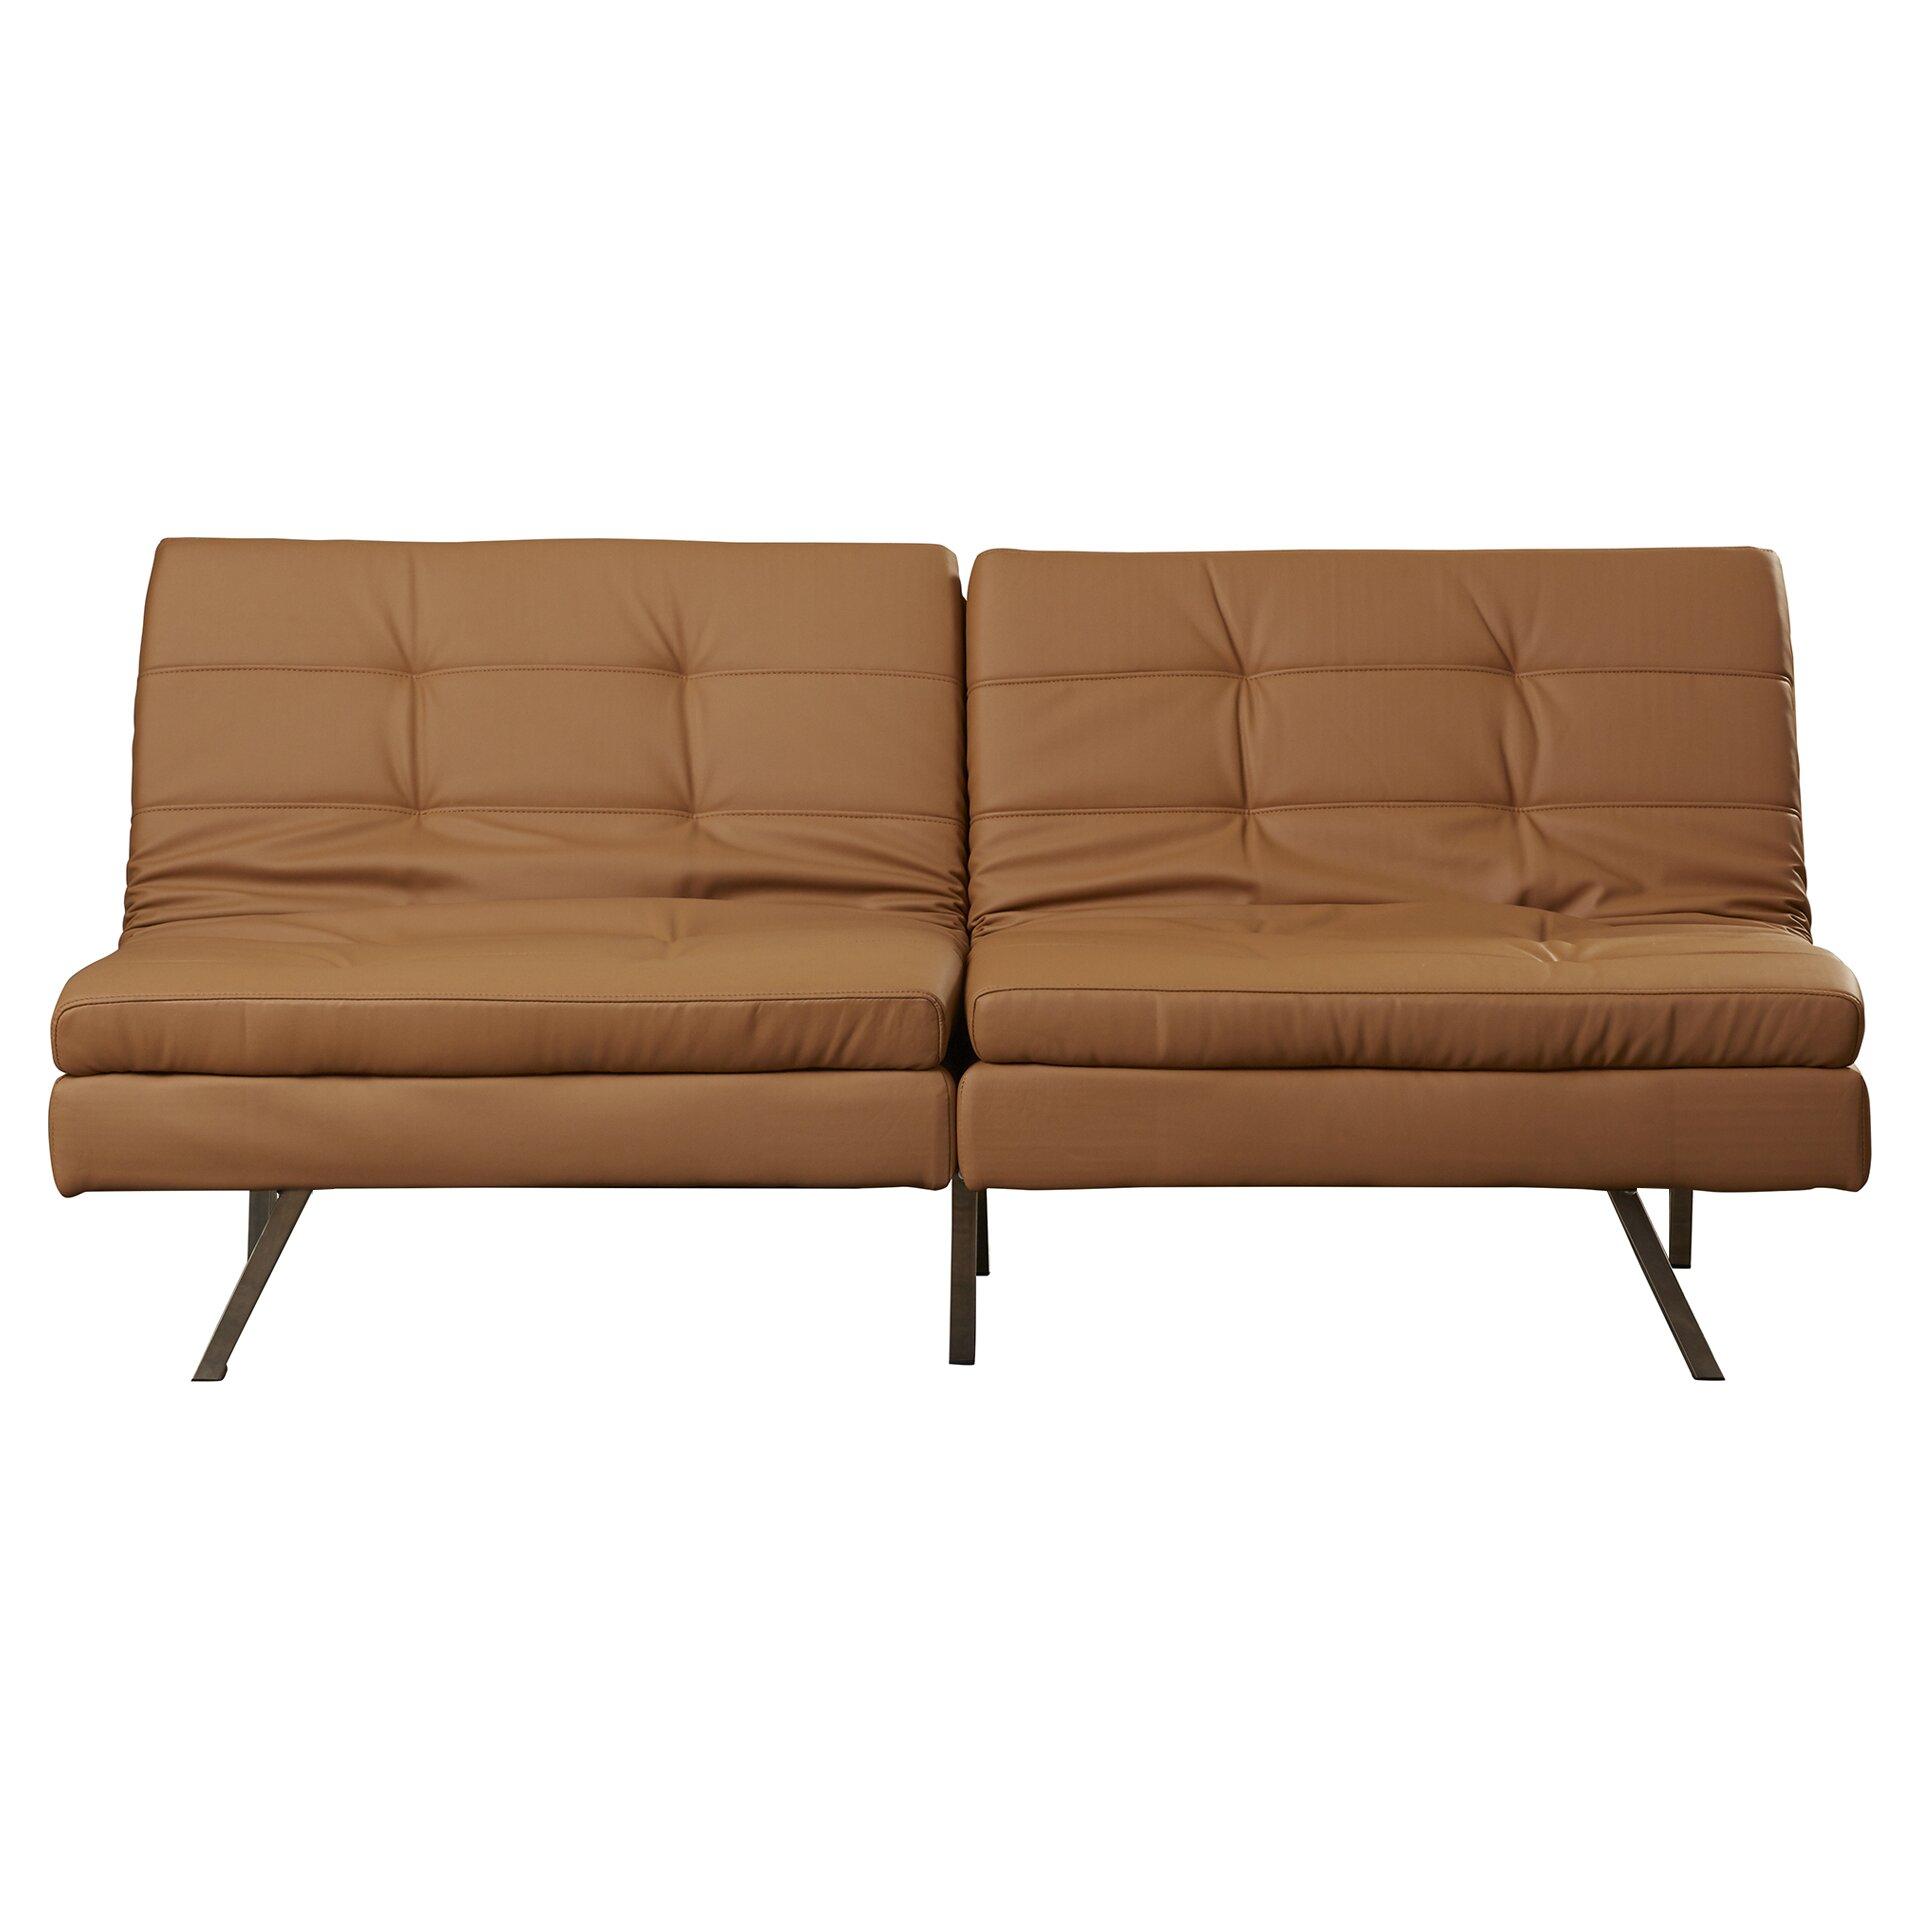 Wade logan devonte foldable futon sofa bed reviews wayfair for Futon sofa bed reviews